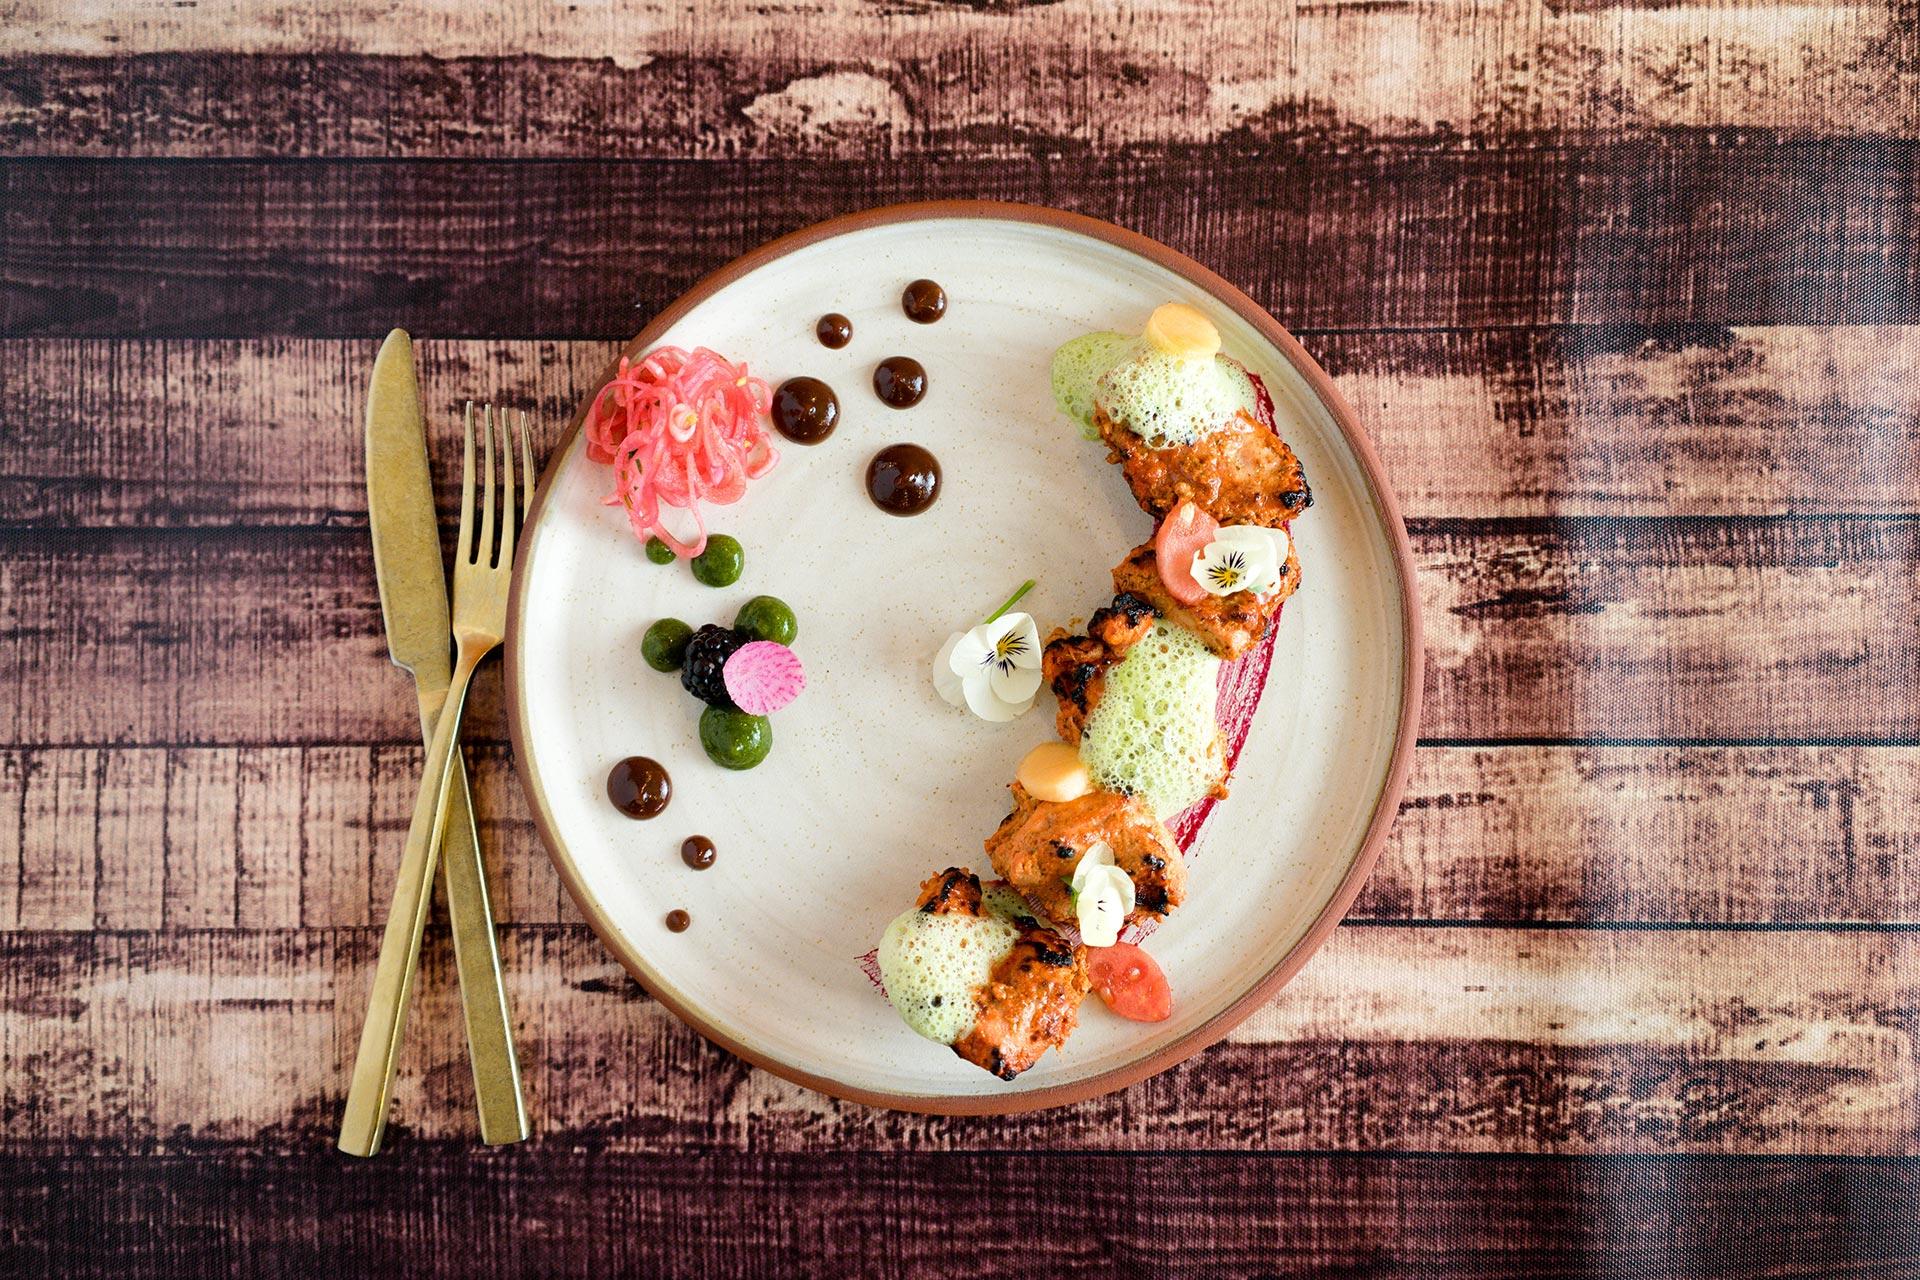 san-francisco-restaurant-food-photographer-a-few-good-clicks-net-86.jpg